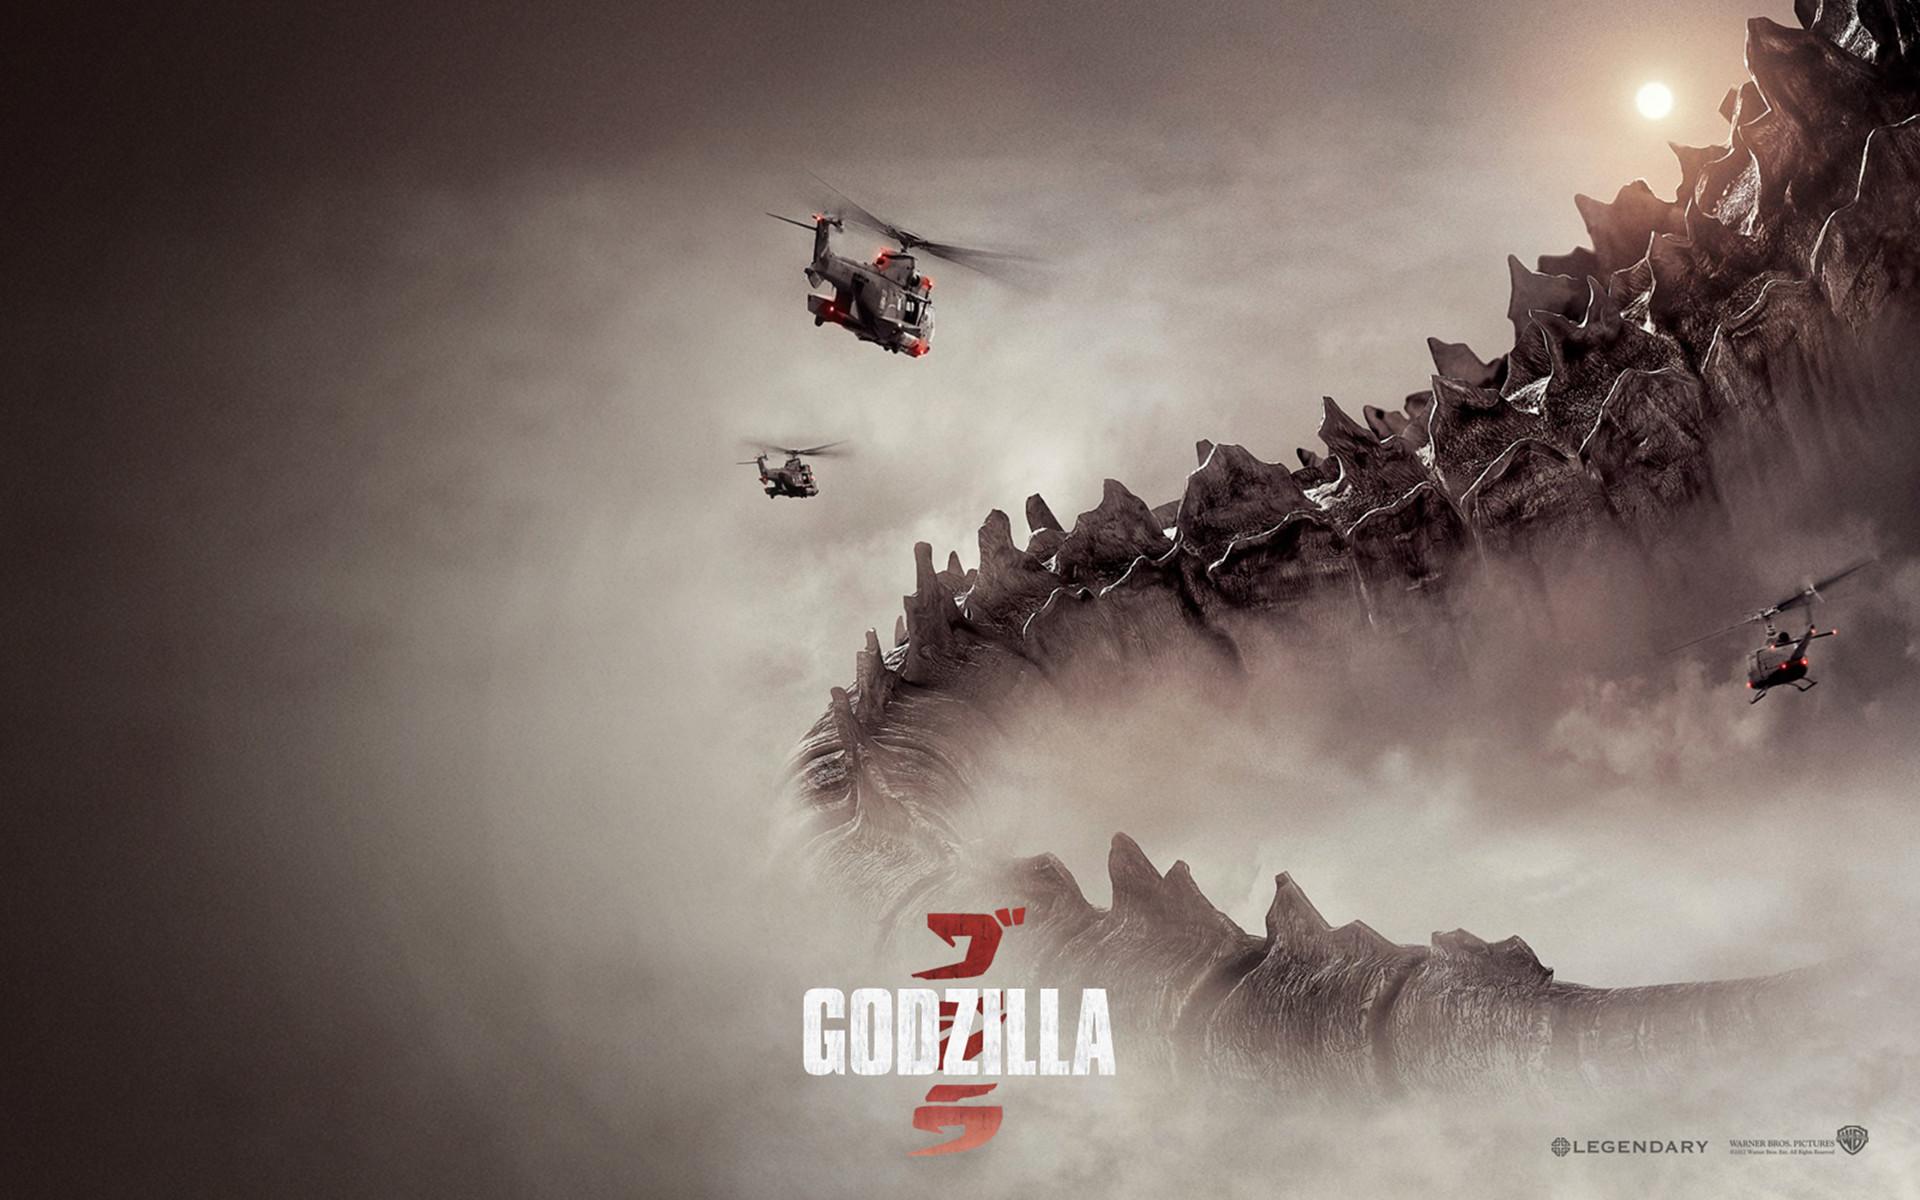 New Godzilla Movie · Godzilla Poster Movie wallpaper